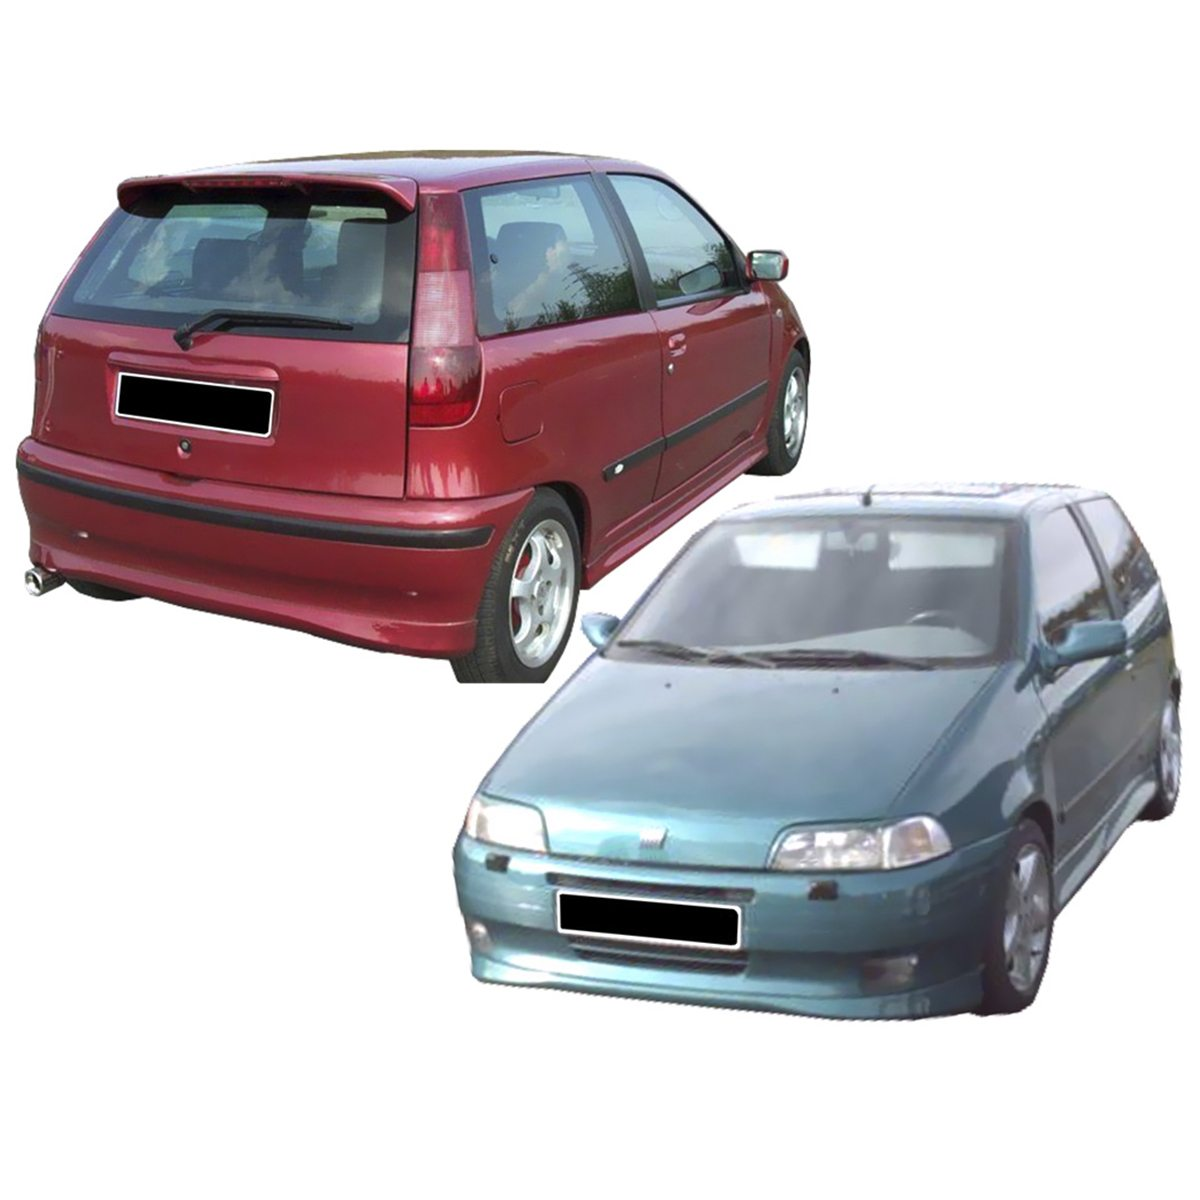 Fiat-Punto-Easy-KIT-QTU213